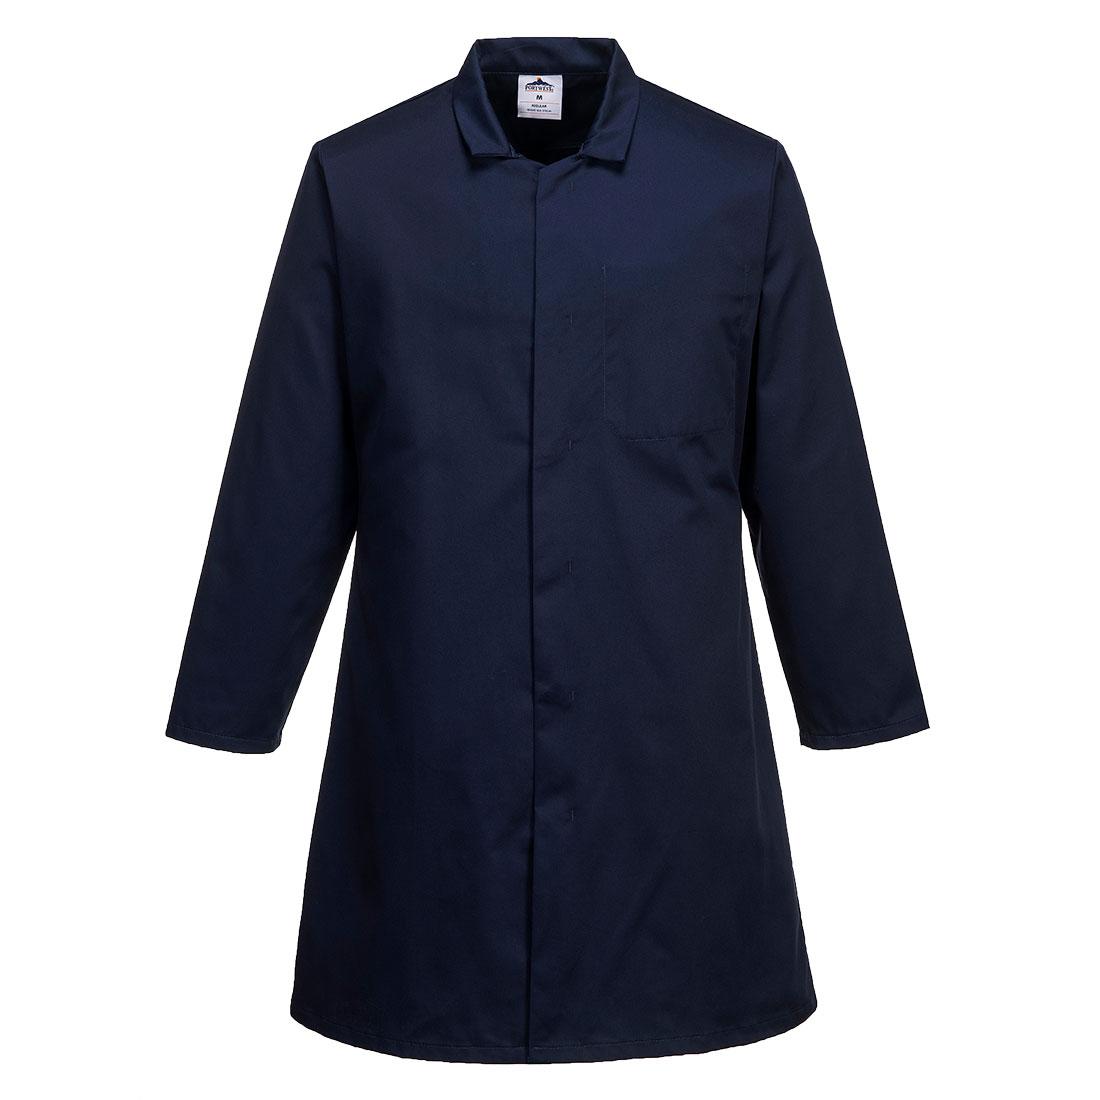 Mens Food Coat One Pocket Navy LR